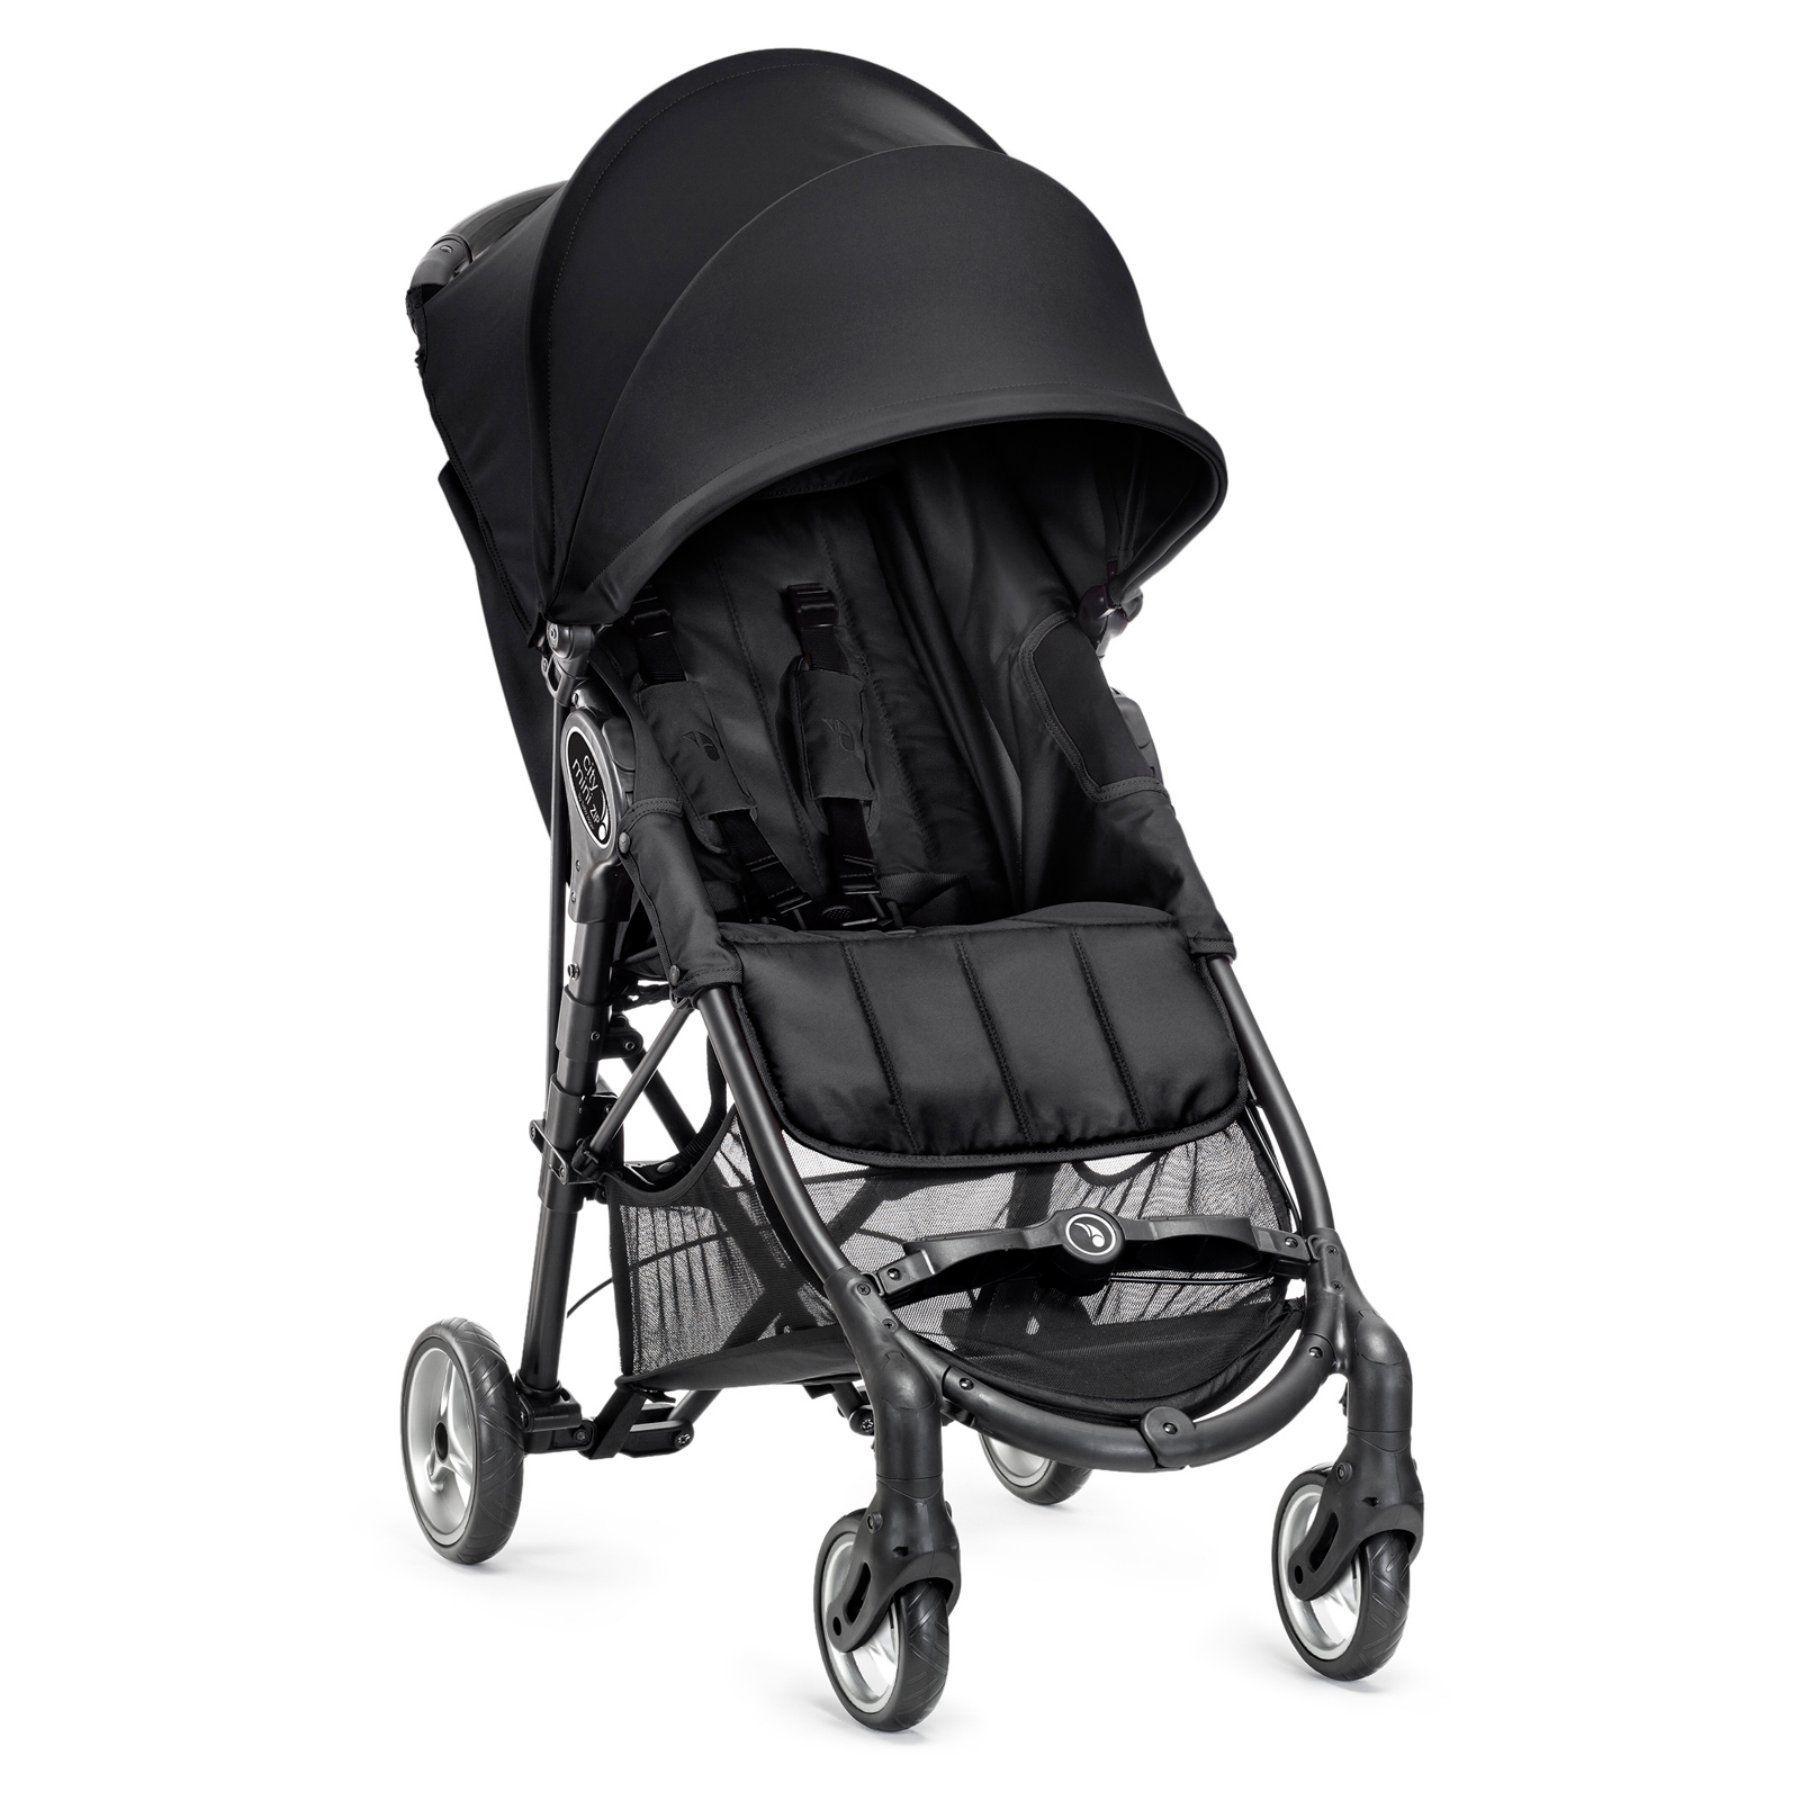 Baby Jogger City Mini ZIP Stroller Black BJ24410